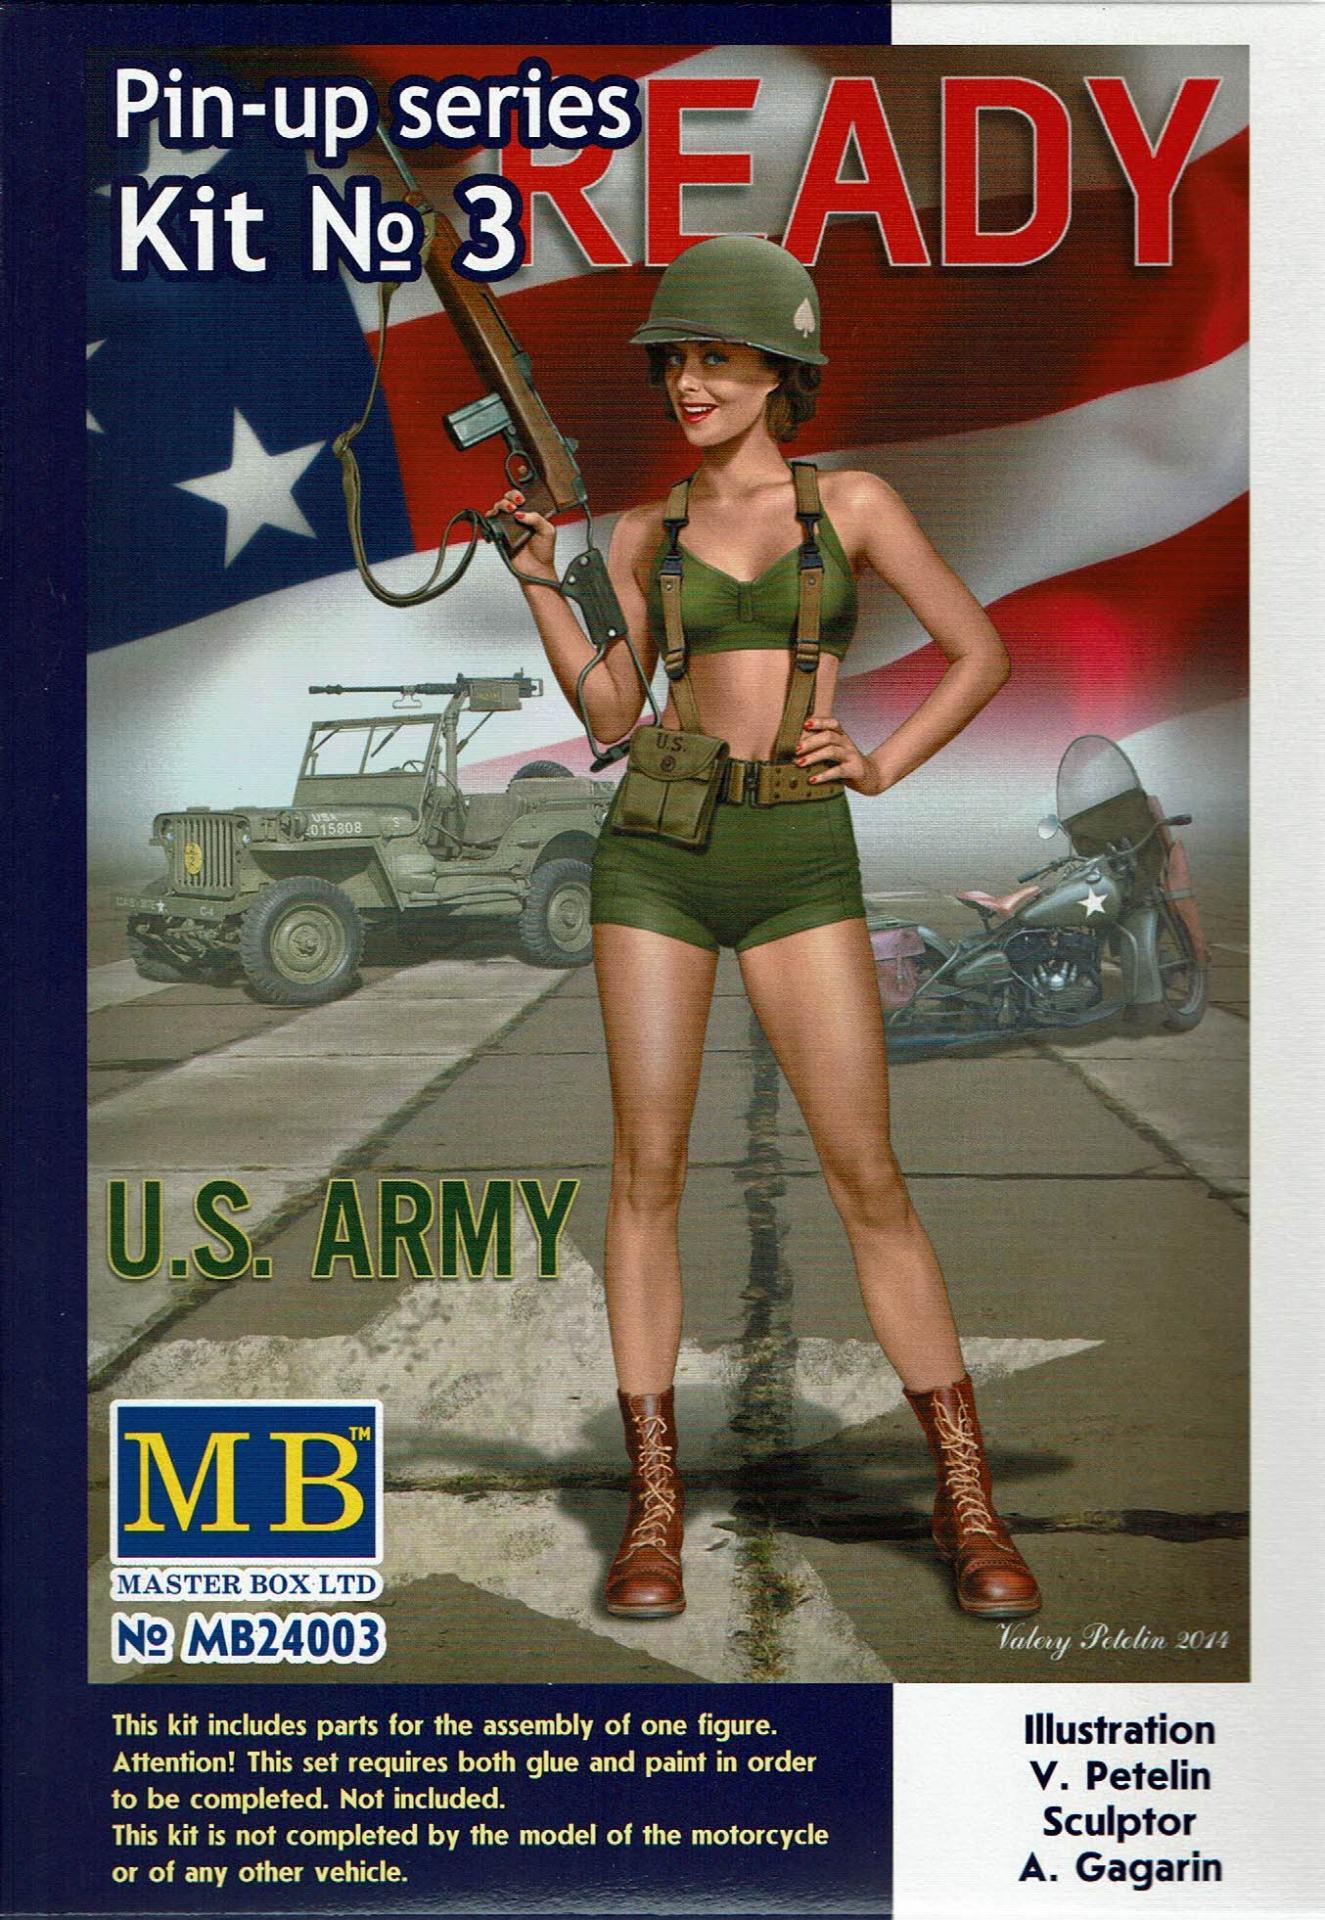 1/24 Alice U.S. Army Pin Up series kit nº 3